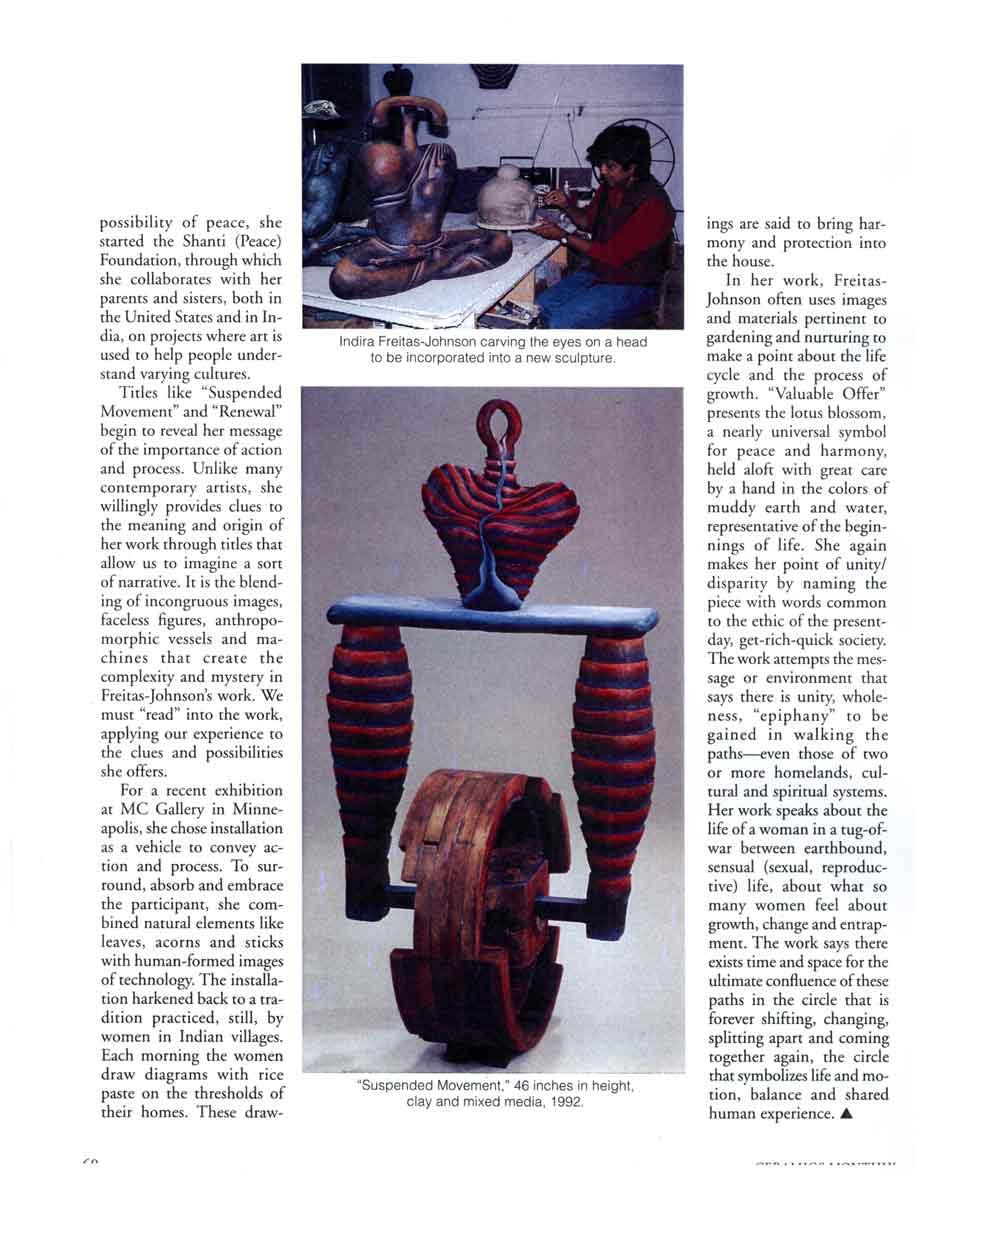 Valuable Offerings: The Ceramic Sculpture of Indira Freitas-Johnson, article, pg 3